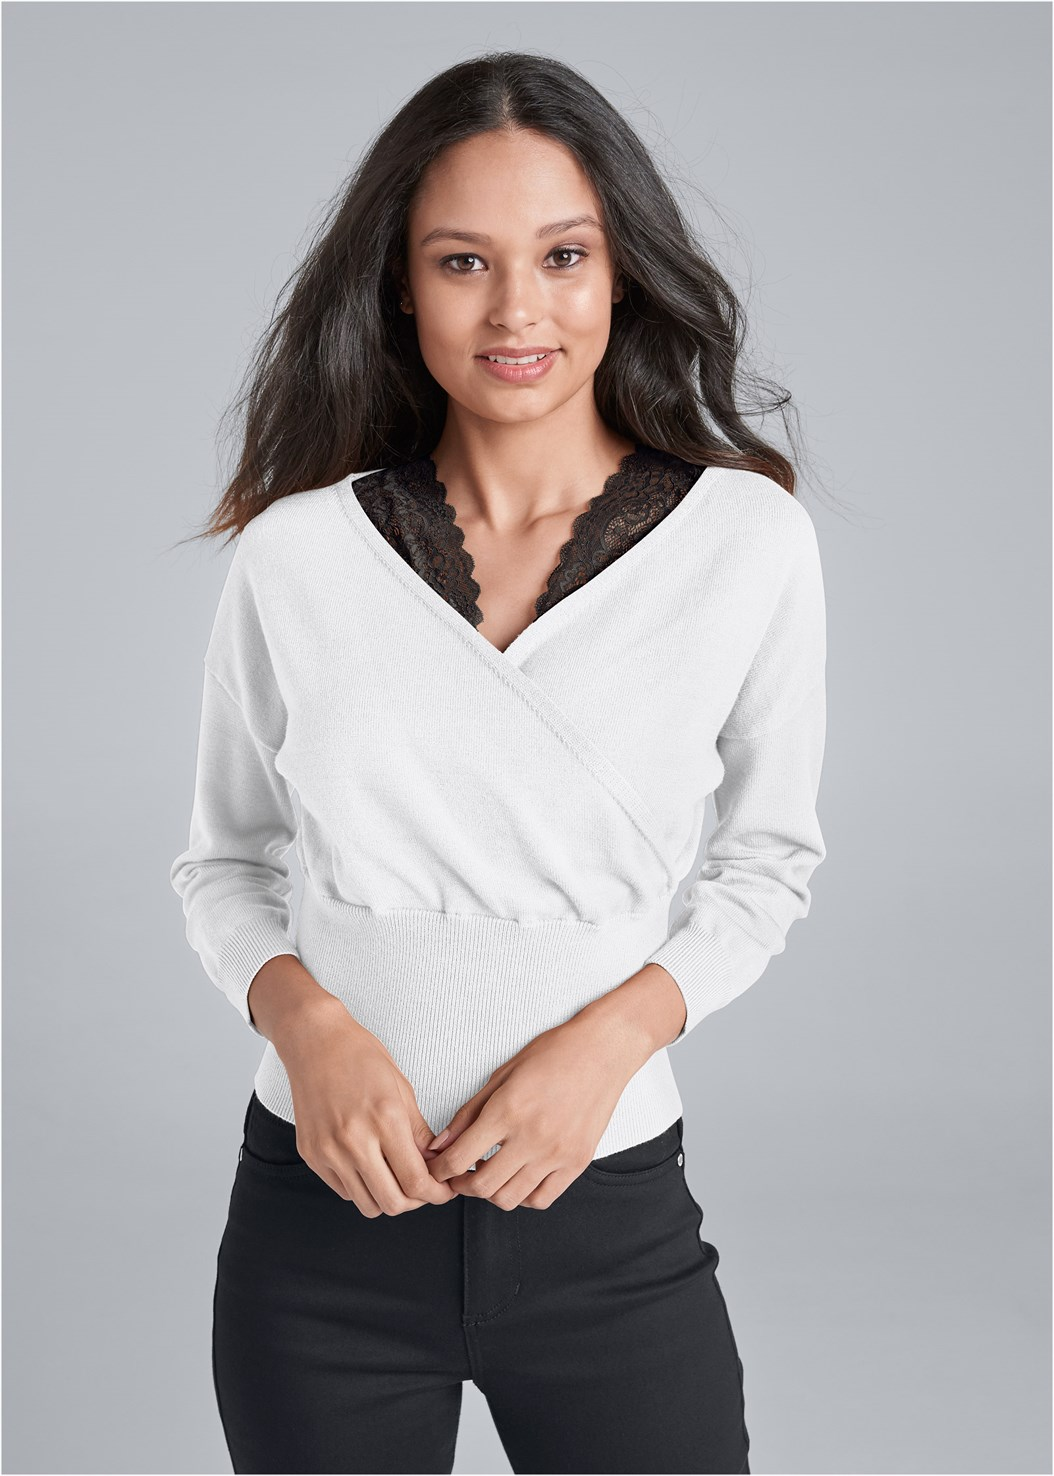 Cross Front Lace Sweater,Bum Lifter Jeans,Thong Strap Kitten Heel